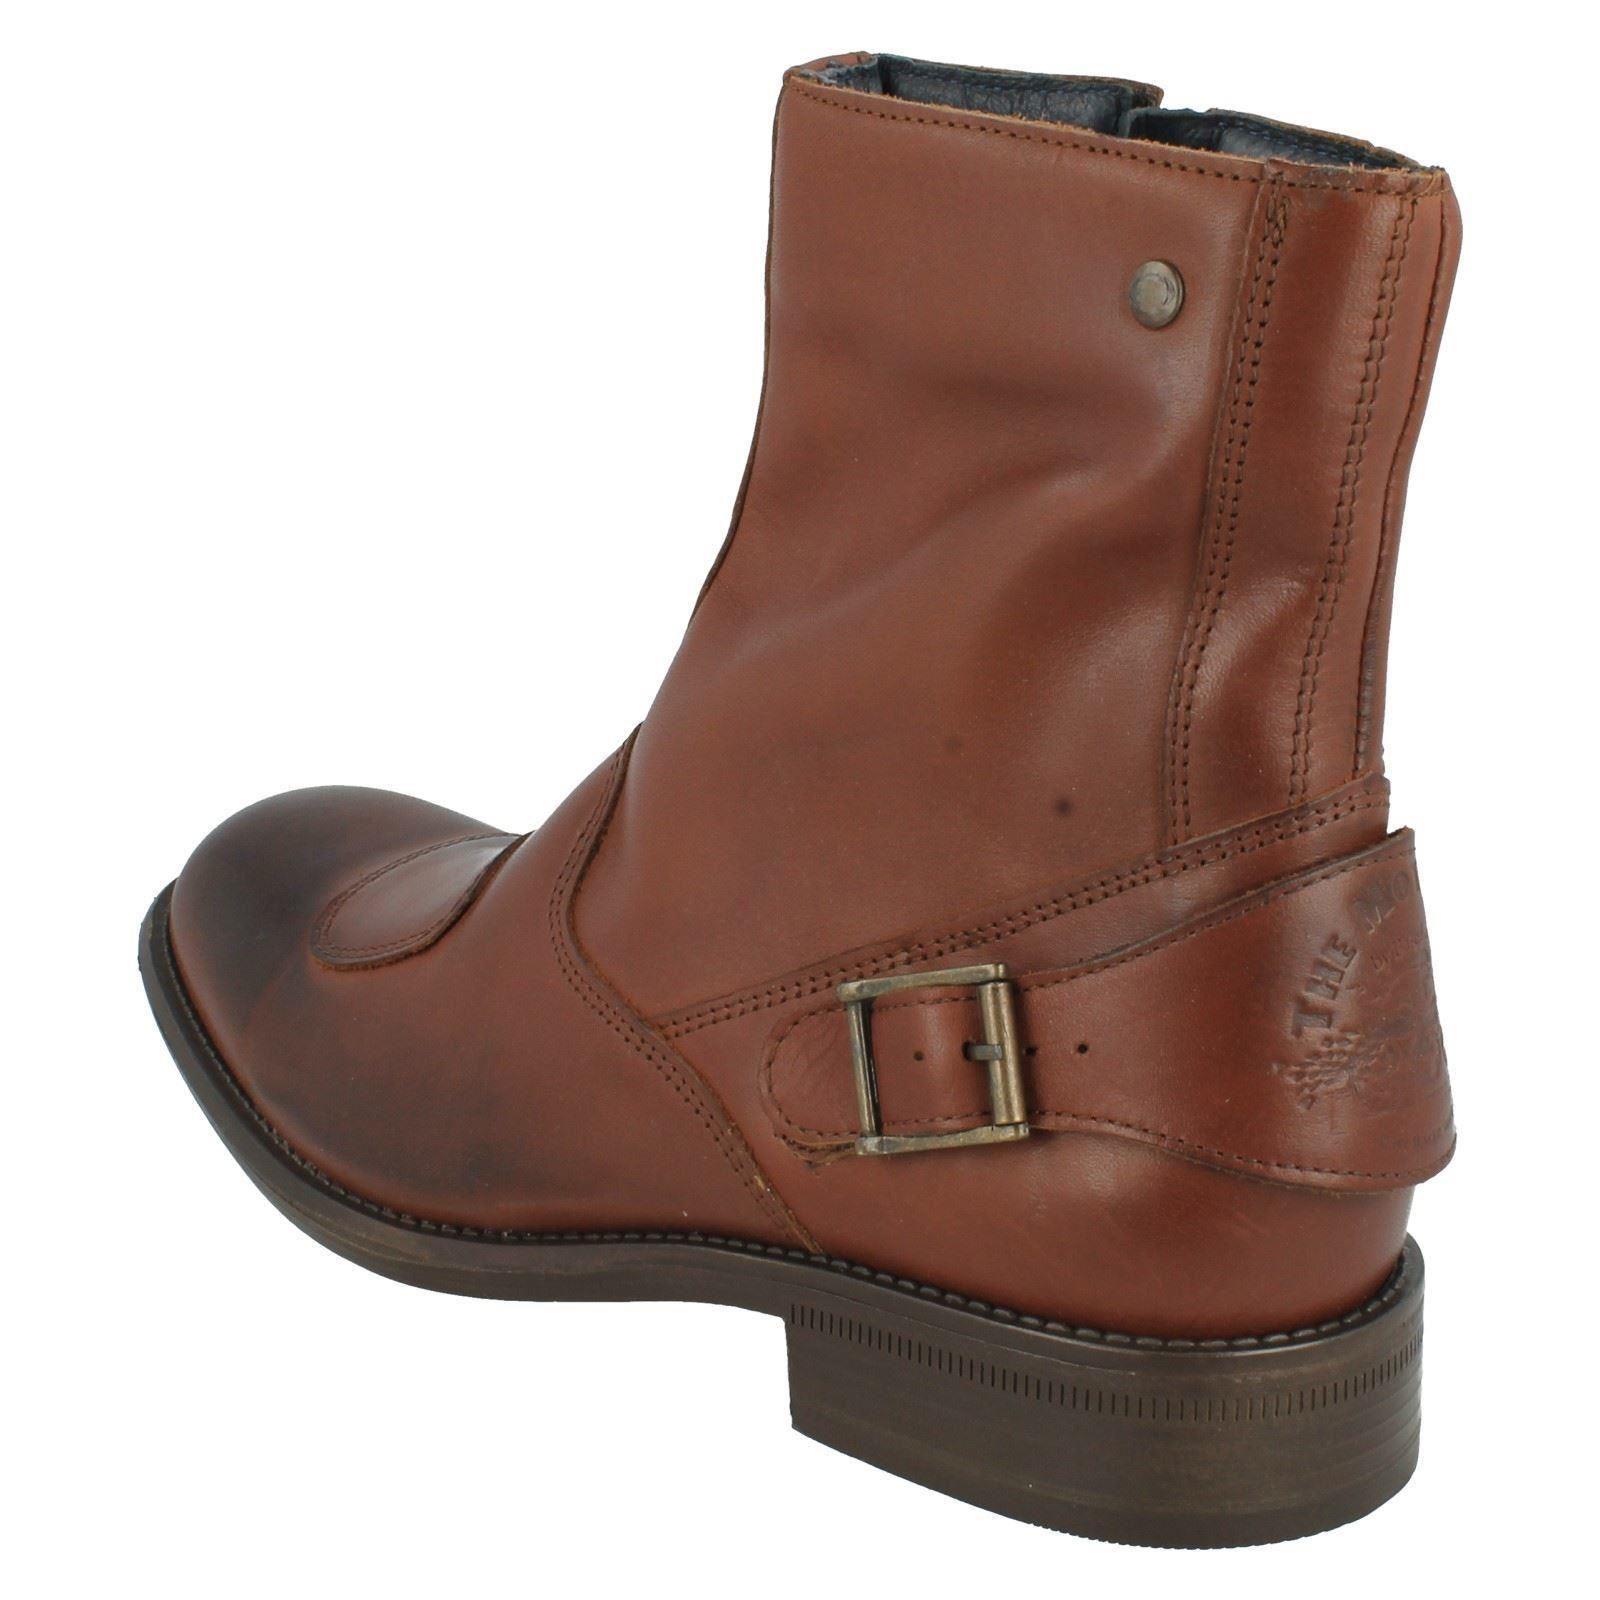 Mens Base London Boots Label - Classic